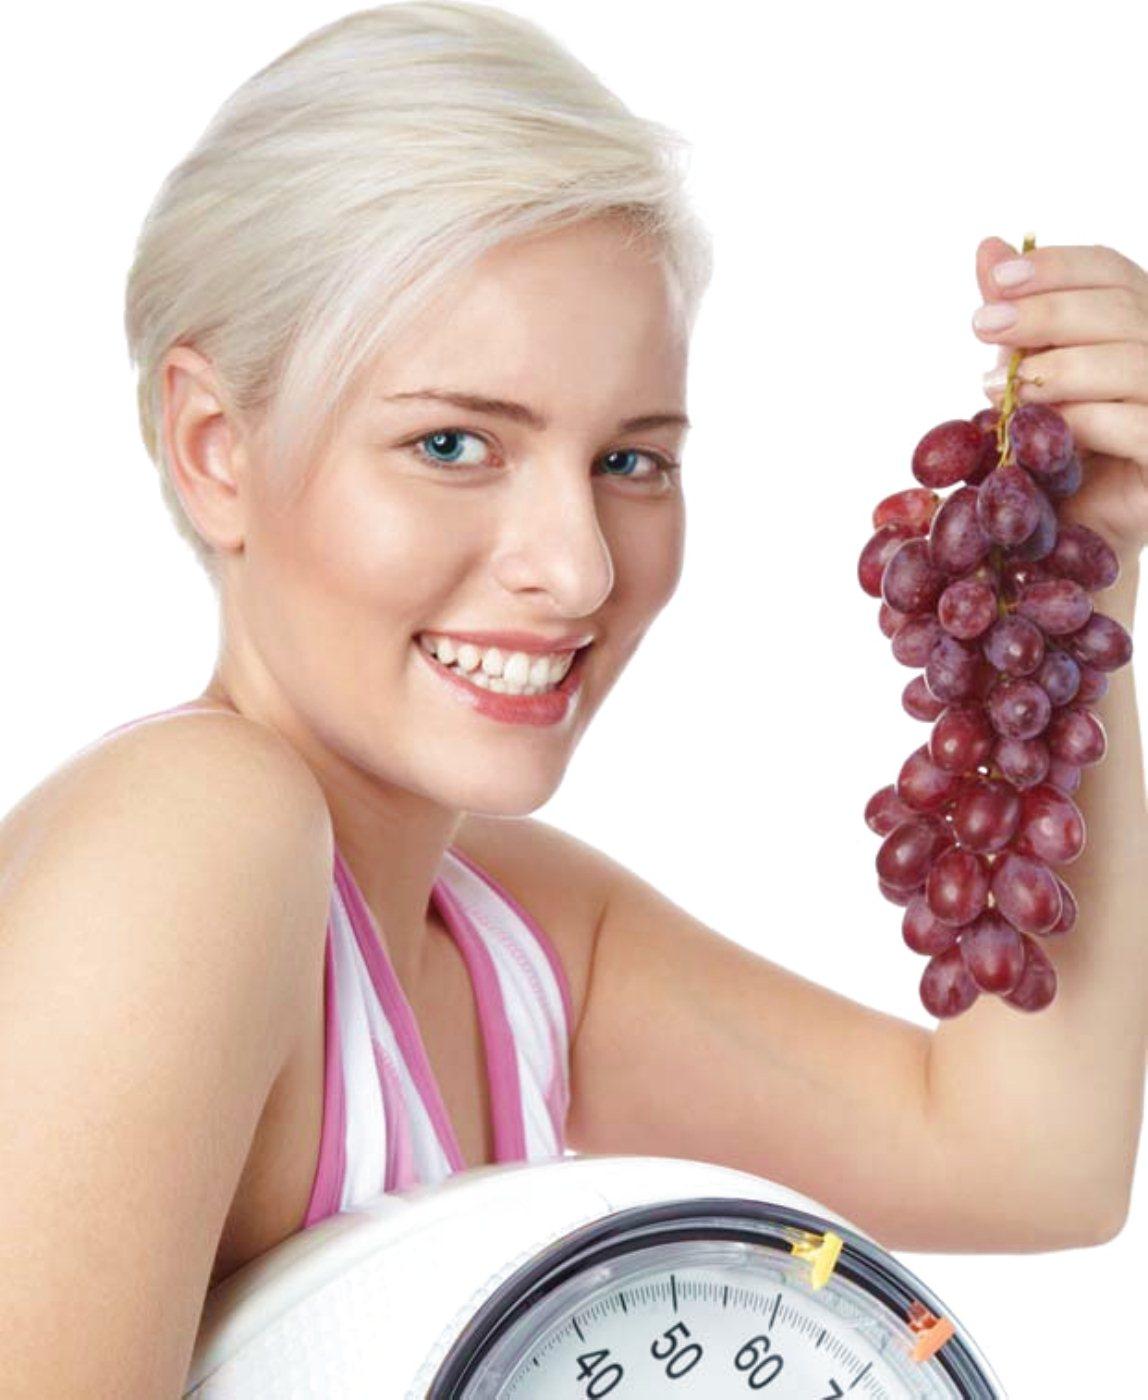 Dieta ipocalorica: dimagrante ed efficace